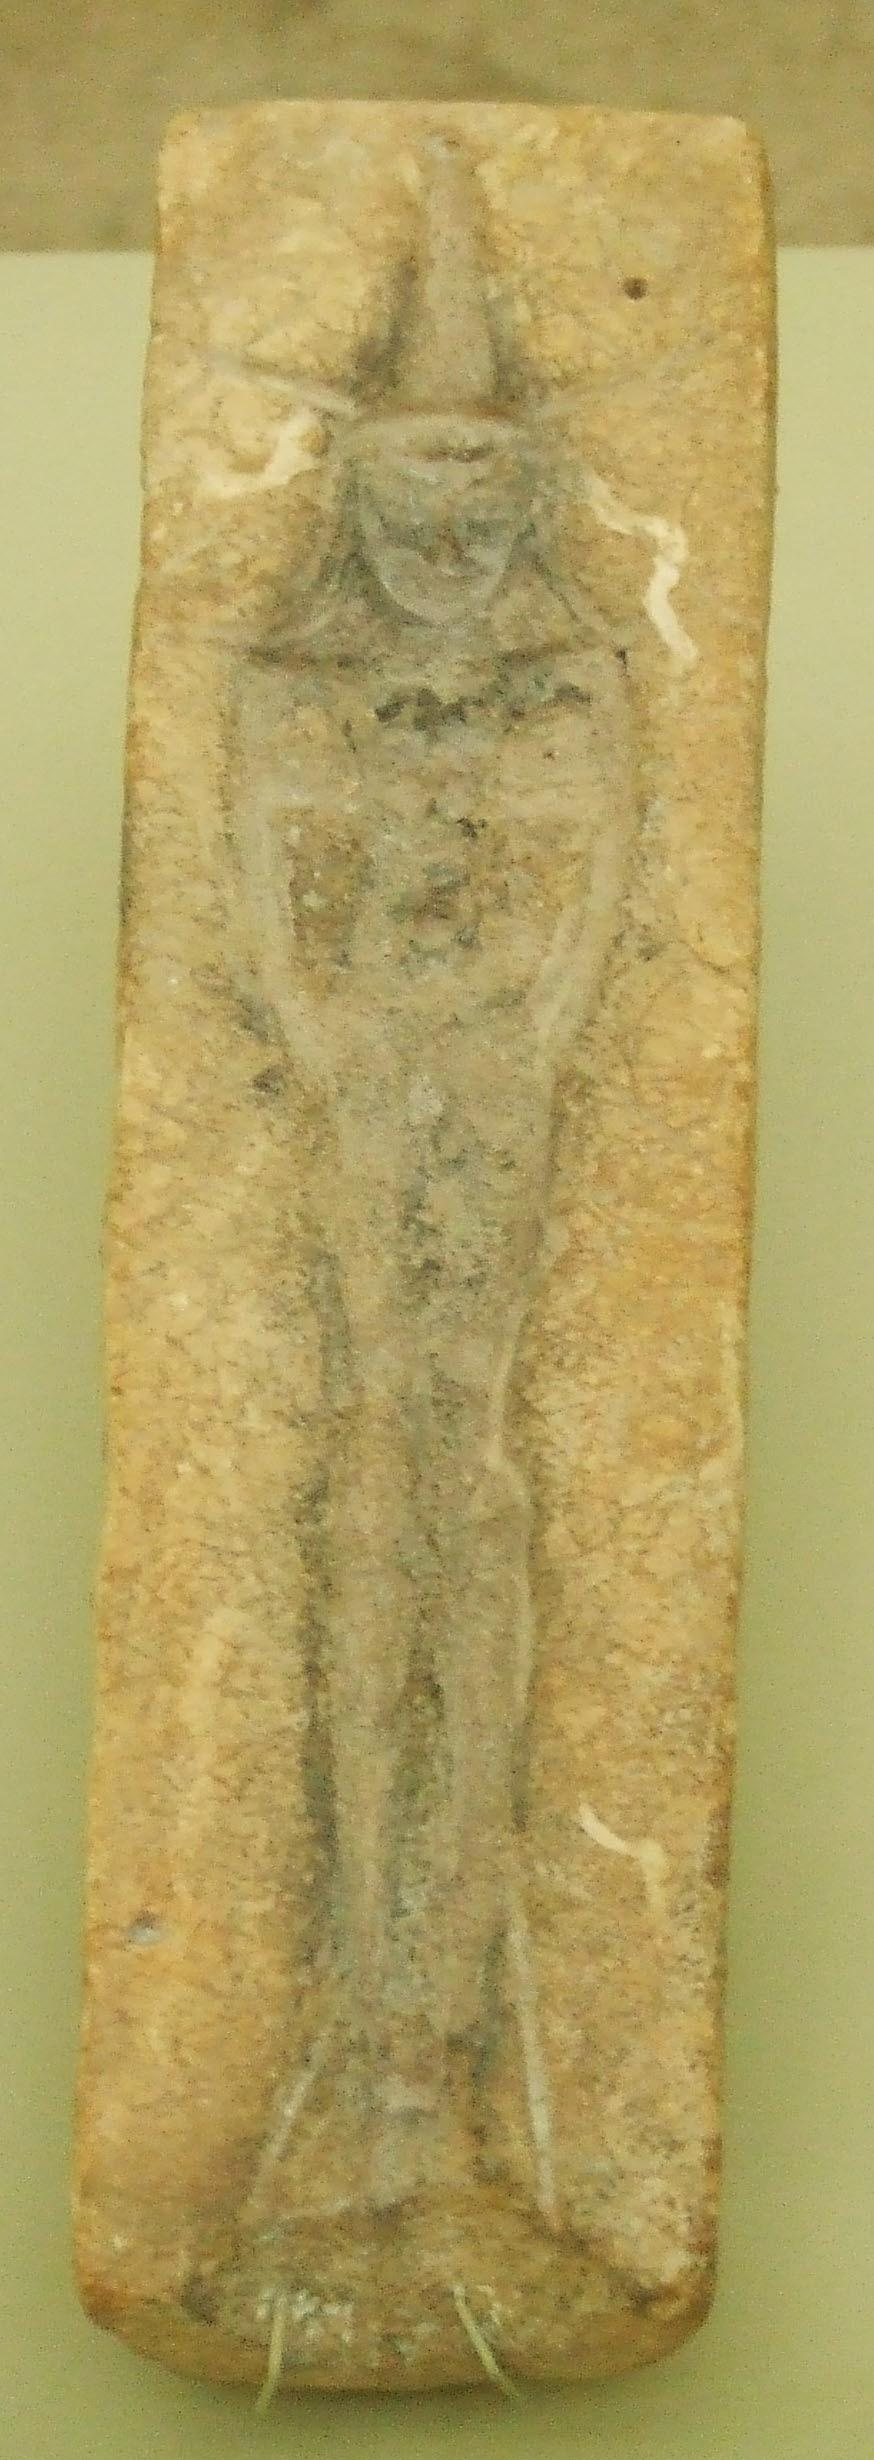 2009-08-israel-museum024_edited.1249228868.JPG